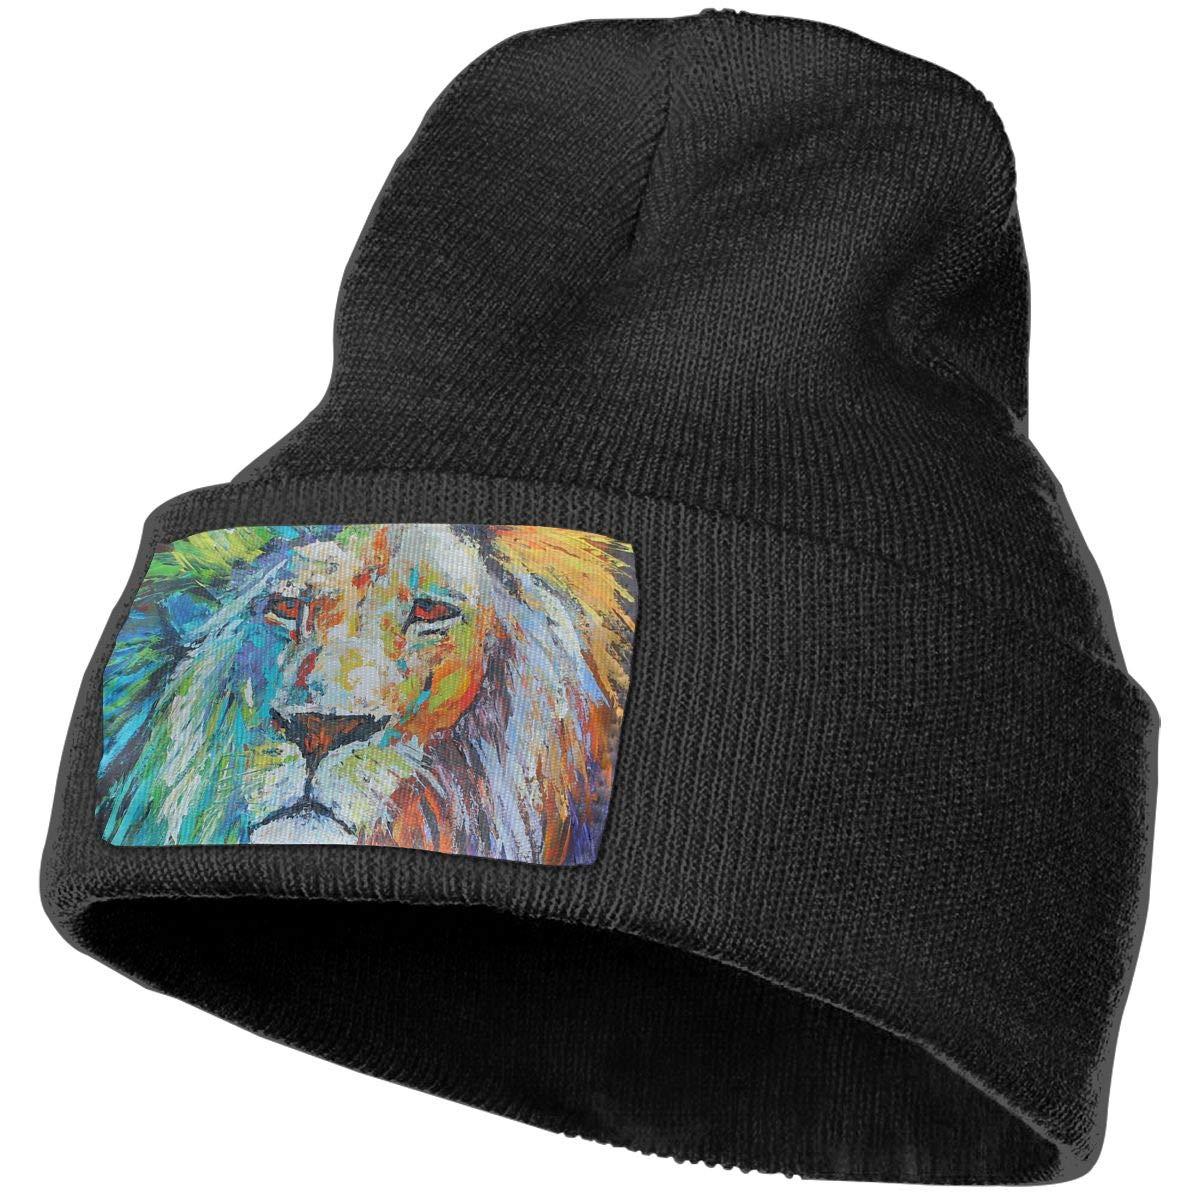 Fashion Lion Art Cuffed Plain Baggy Winter Skull Knit Hat Cap Slouchy Beanie Hat for Men /& Women